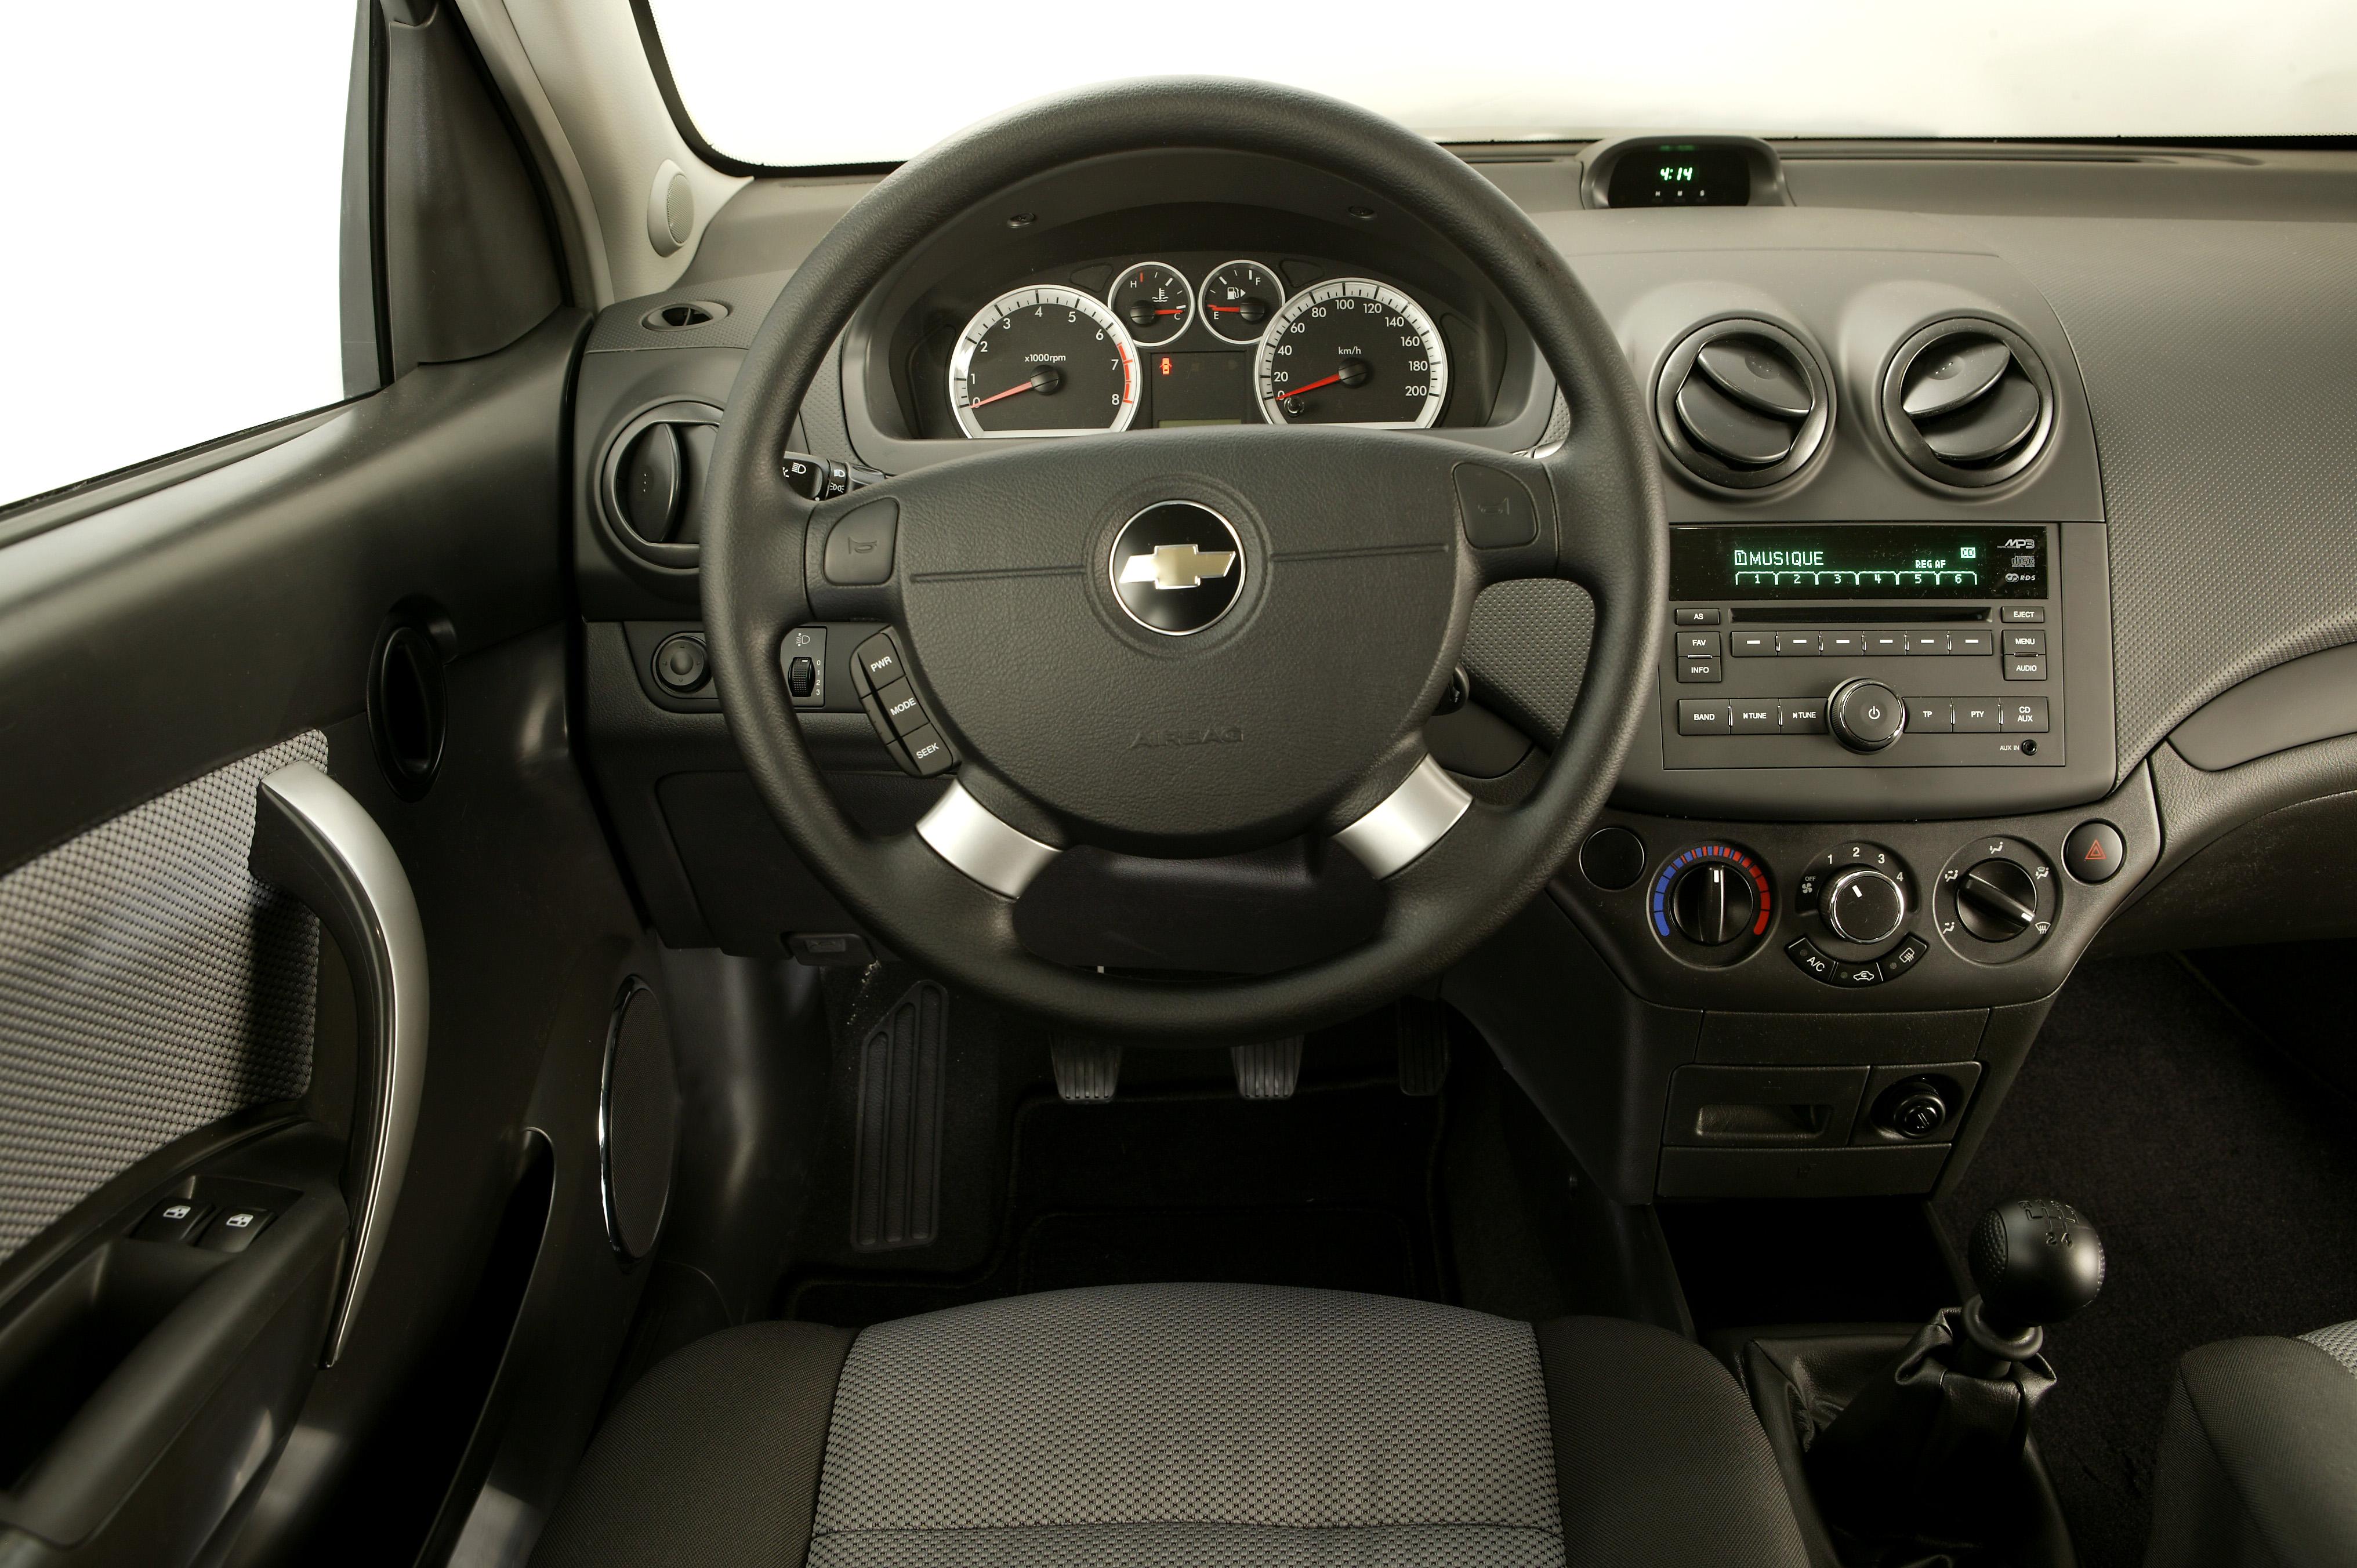 Kekurangan Chevrolet Aveo 2008 Murah Berkualitas